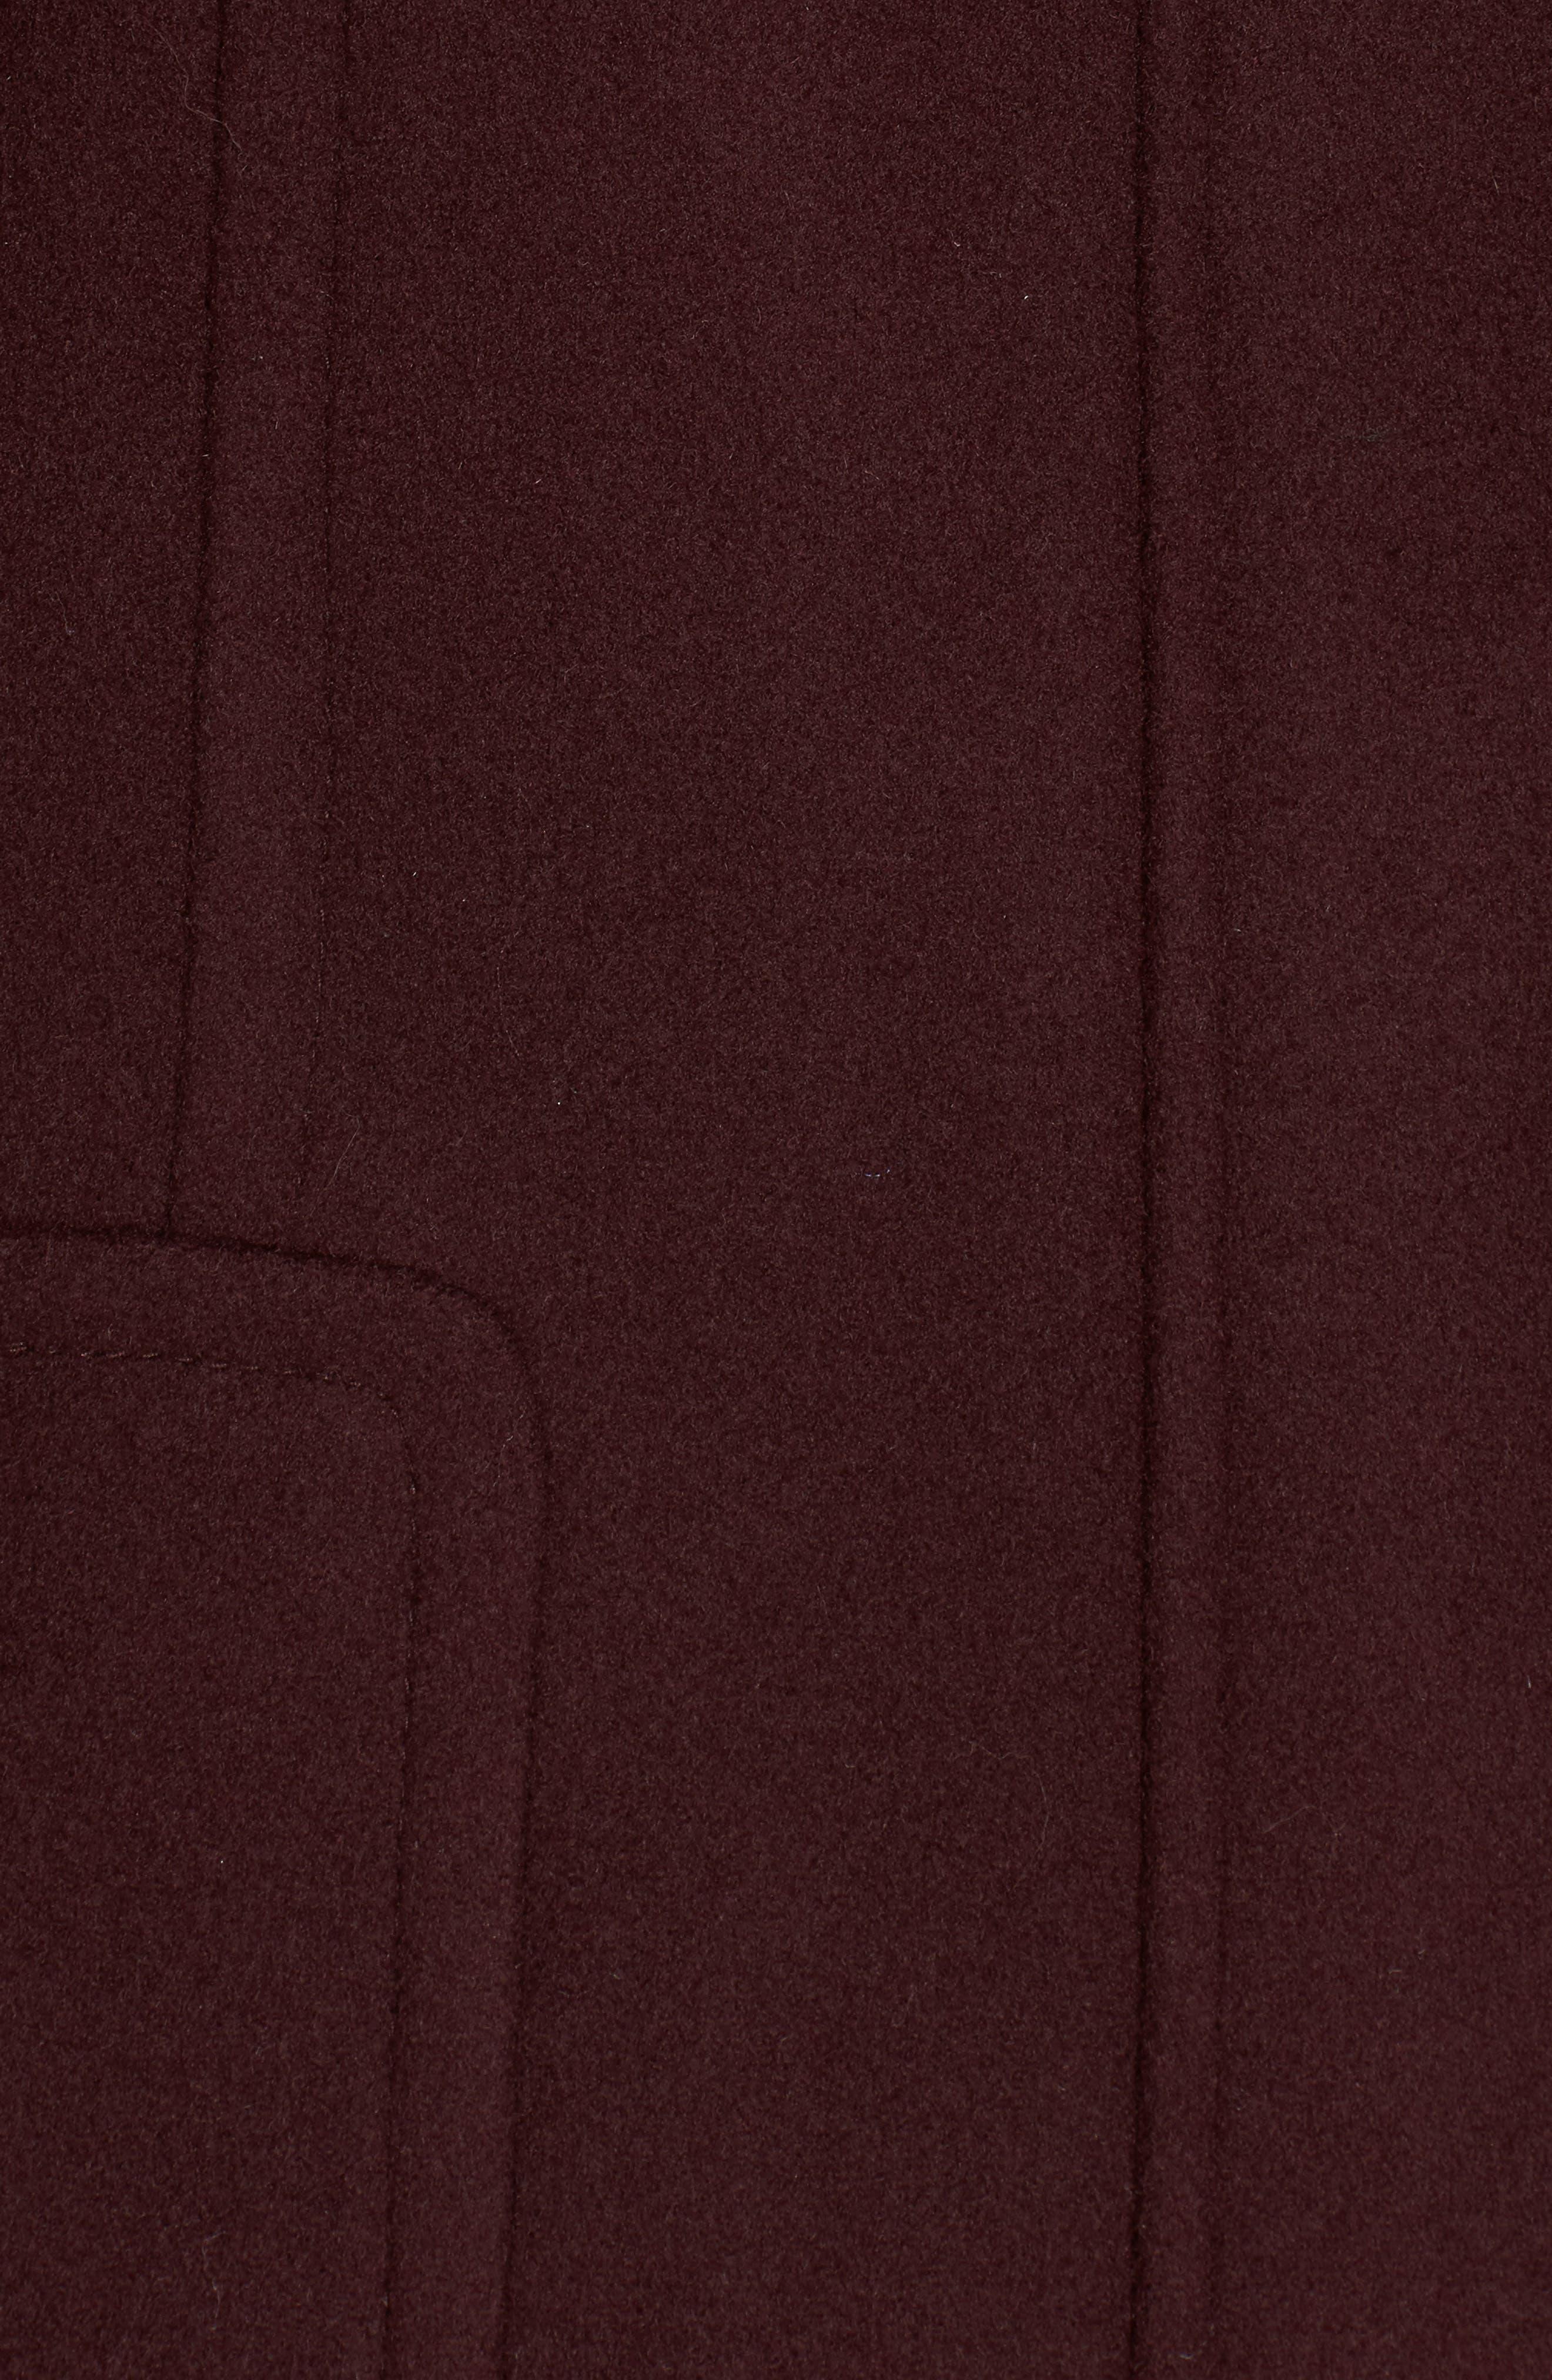 Hooded Wool Blend Coat with Genuine Fox Fur Trim,                             Alternate thumbnail 18, color,